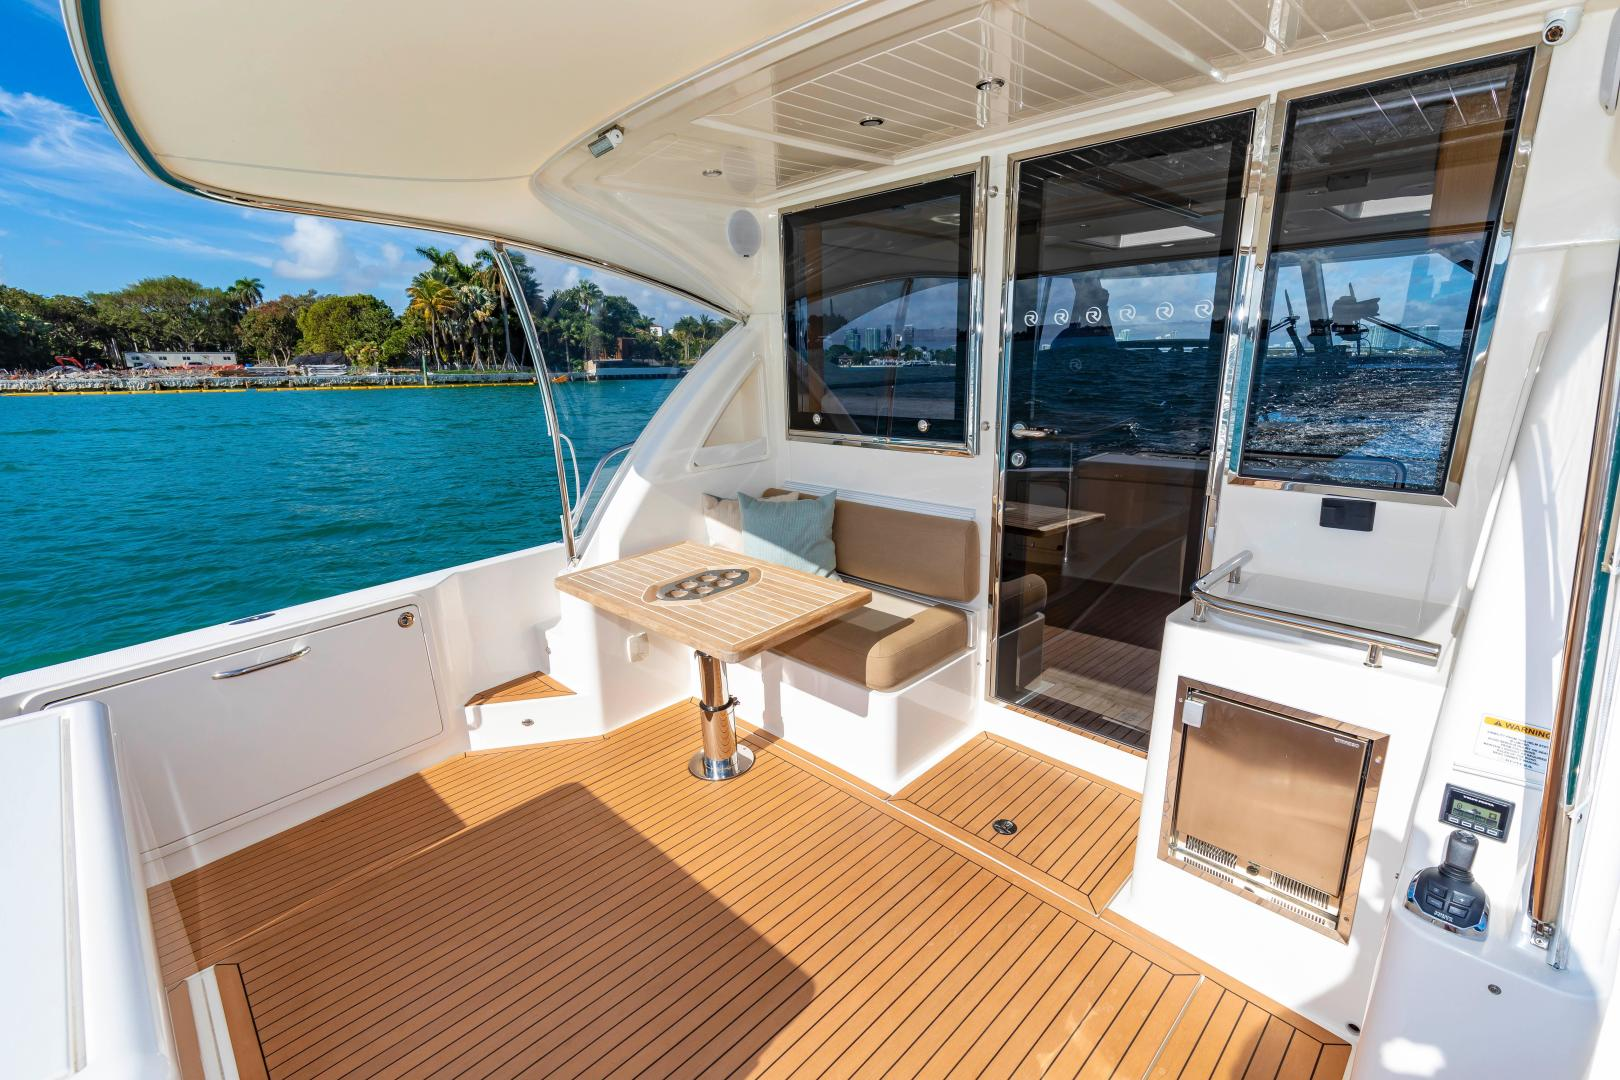 Riviera-395 SUV 2019-Ipanema Miami Beach-Florida-United States-1614881   Thumbnail